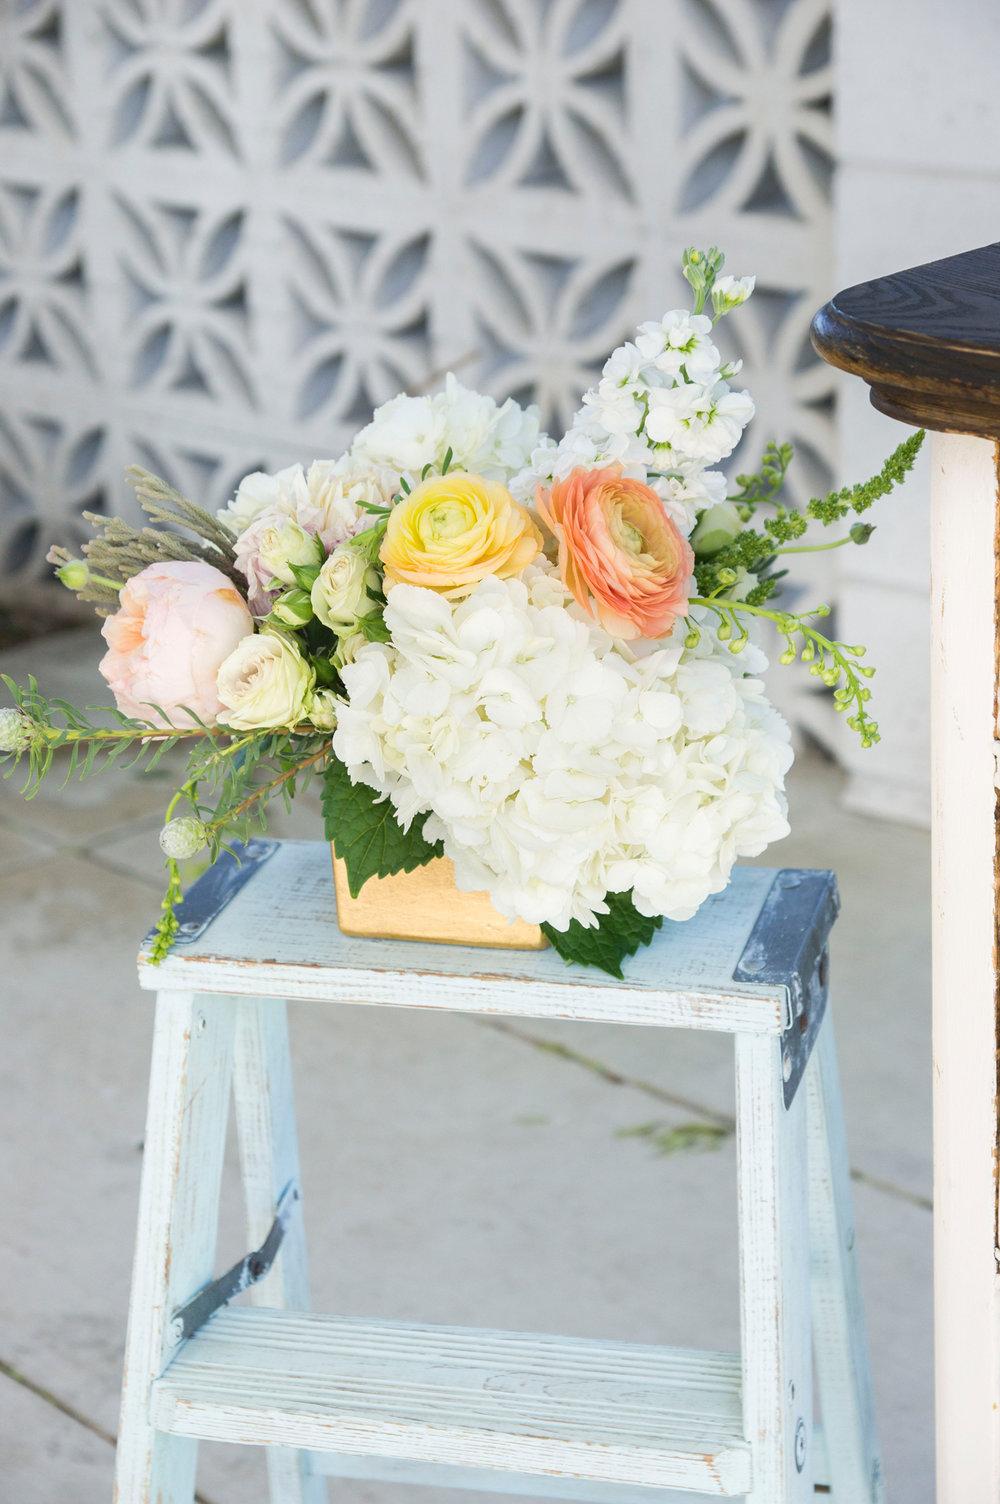 Vintage Wedding Decor - McCoy Equestrian Center Wedding - Peterson Design & Photography